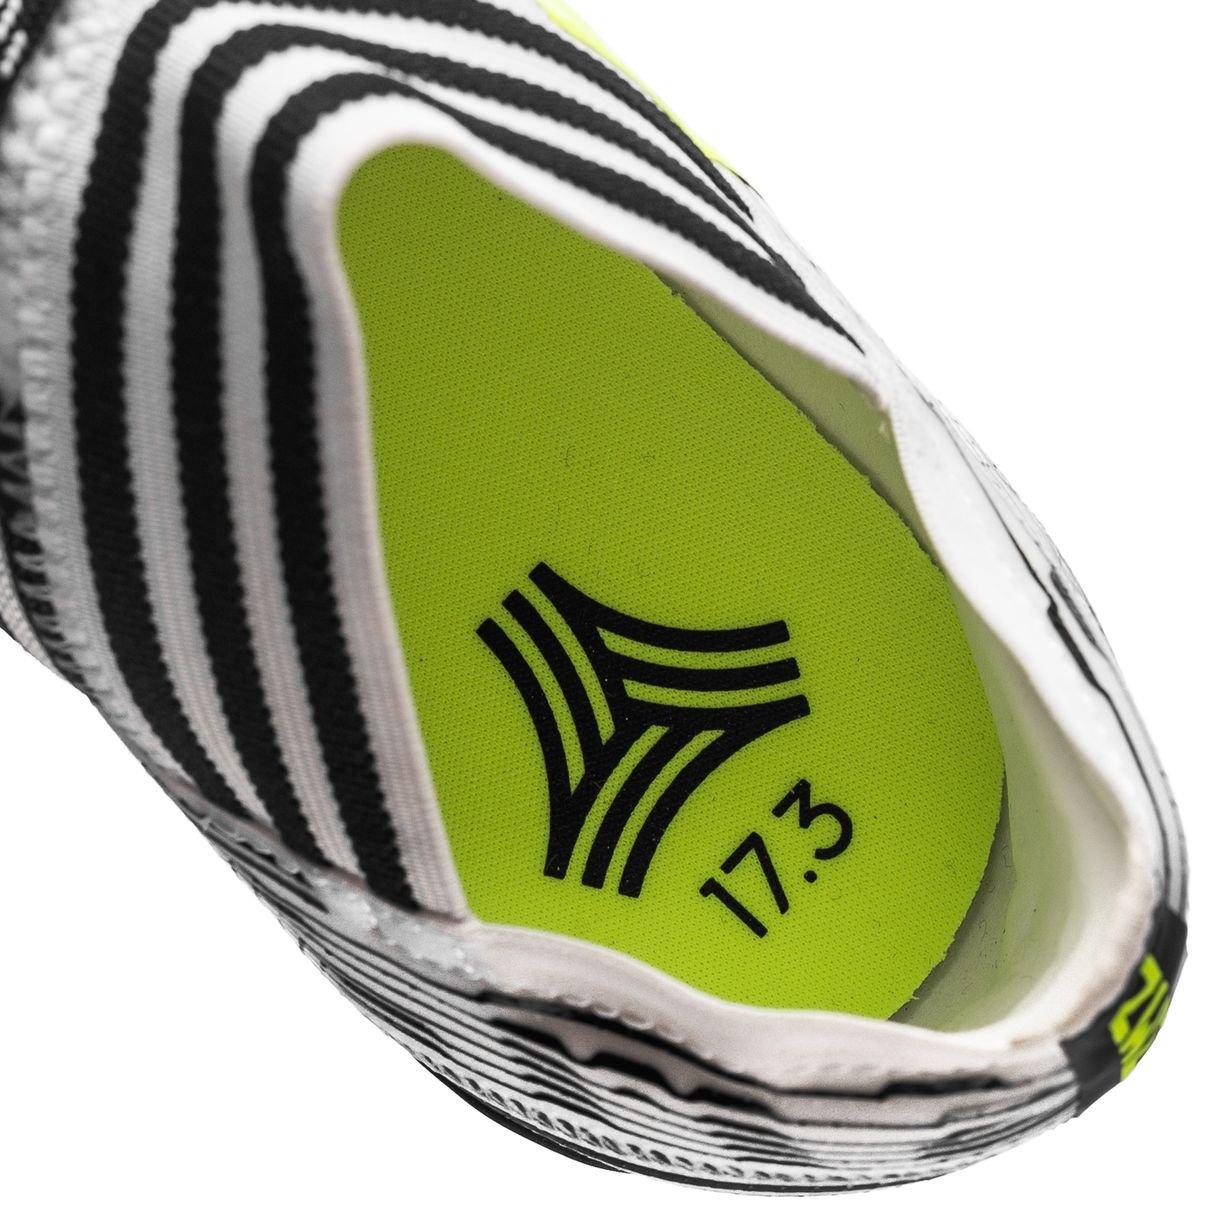 Football shoes adidas NEMEZIZ TANGO 17.3 TF J